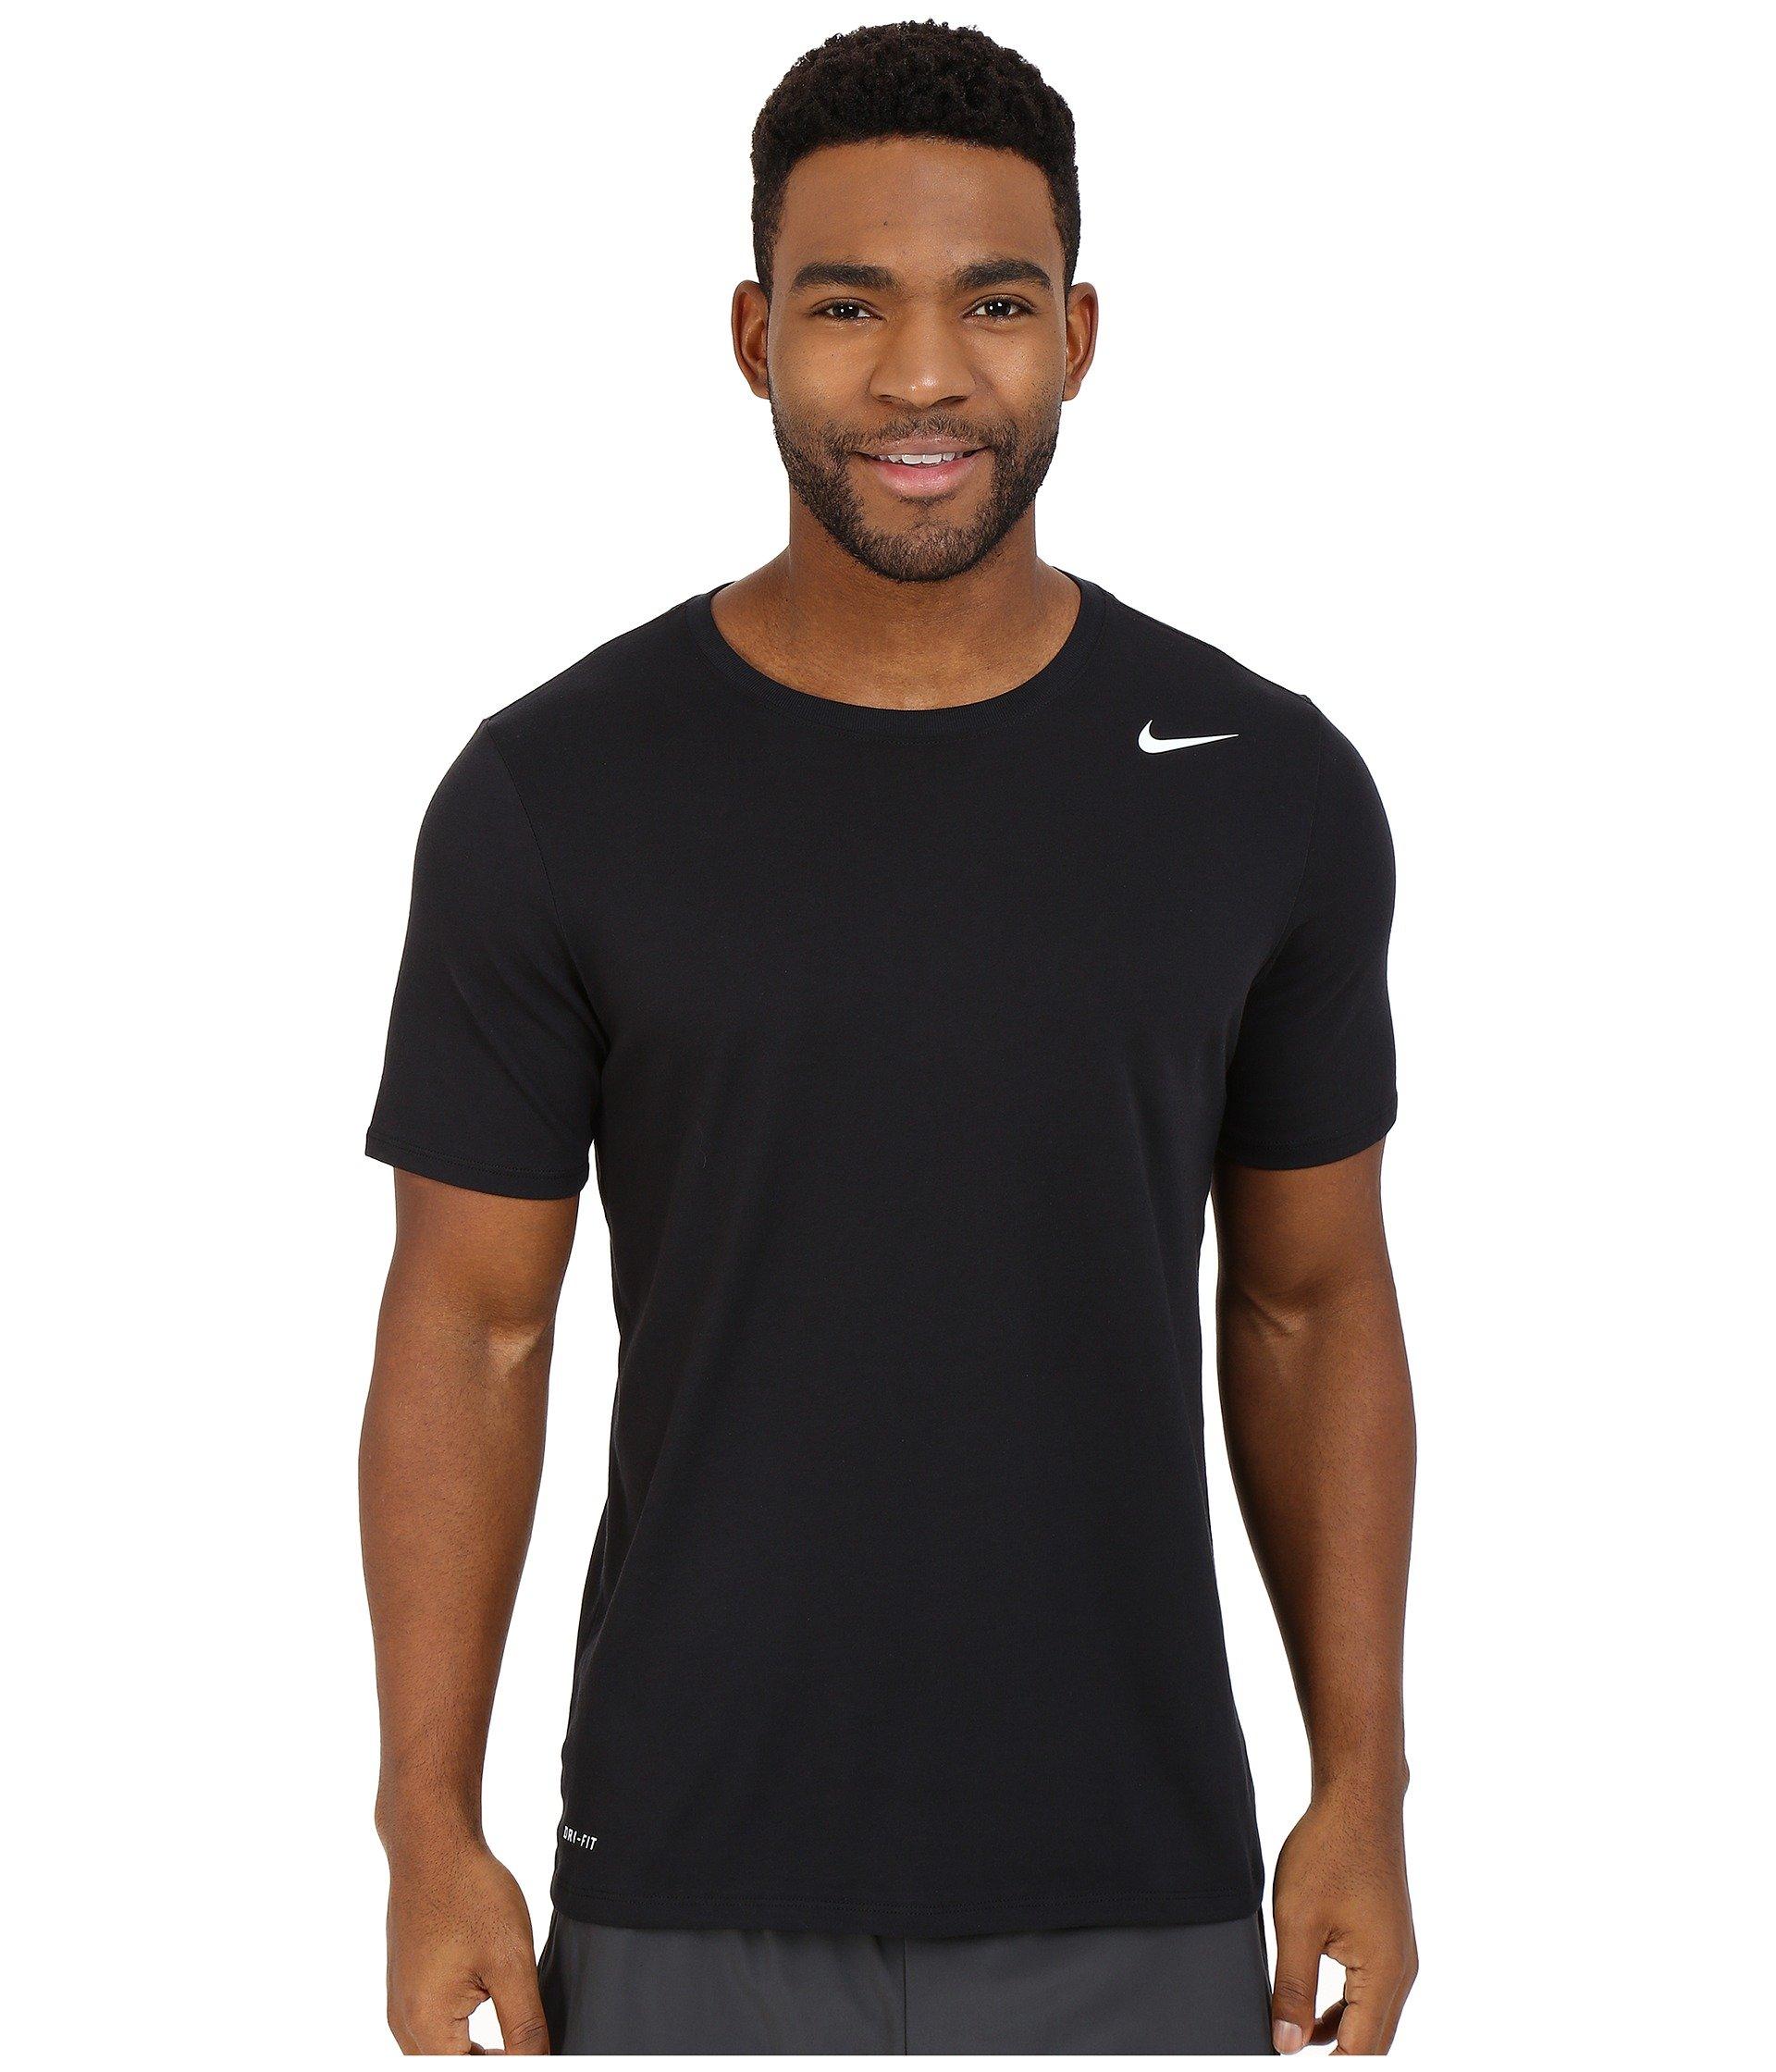 NIKE Men's Dri-FIT Cotton 2.0 Tee, Black/Black/White, Small by Nike (Image #3)